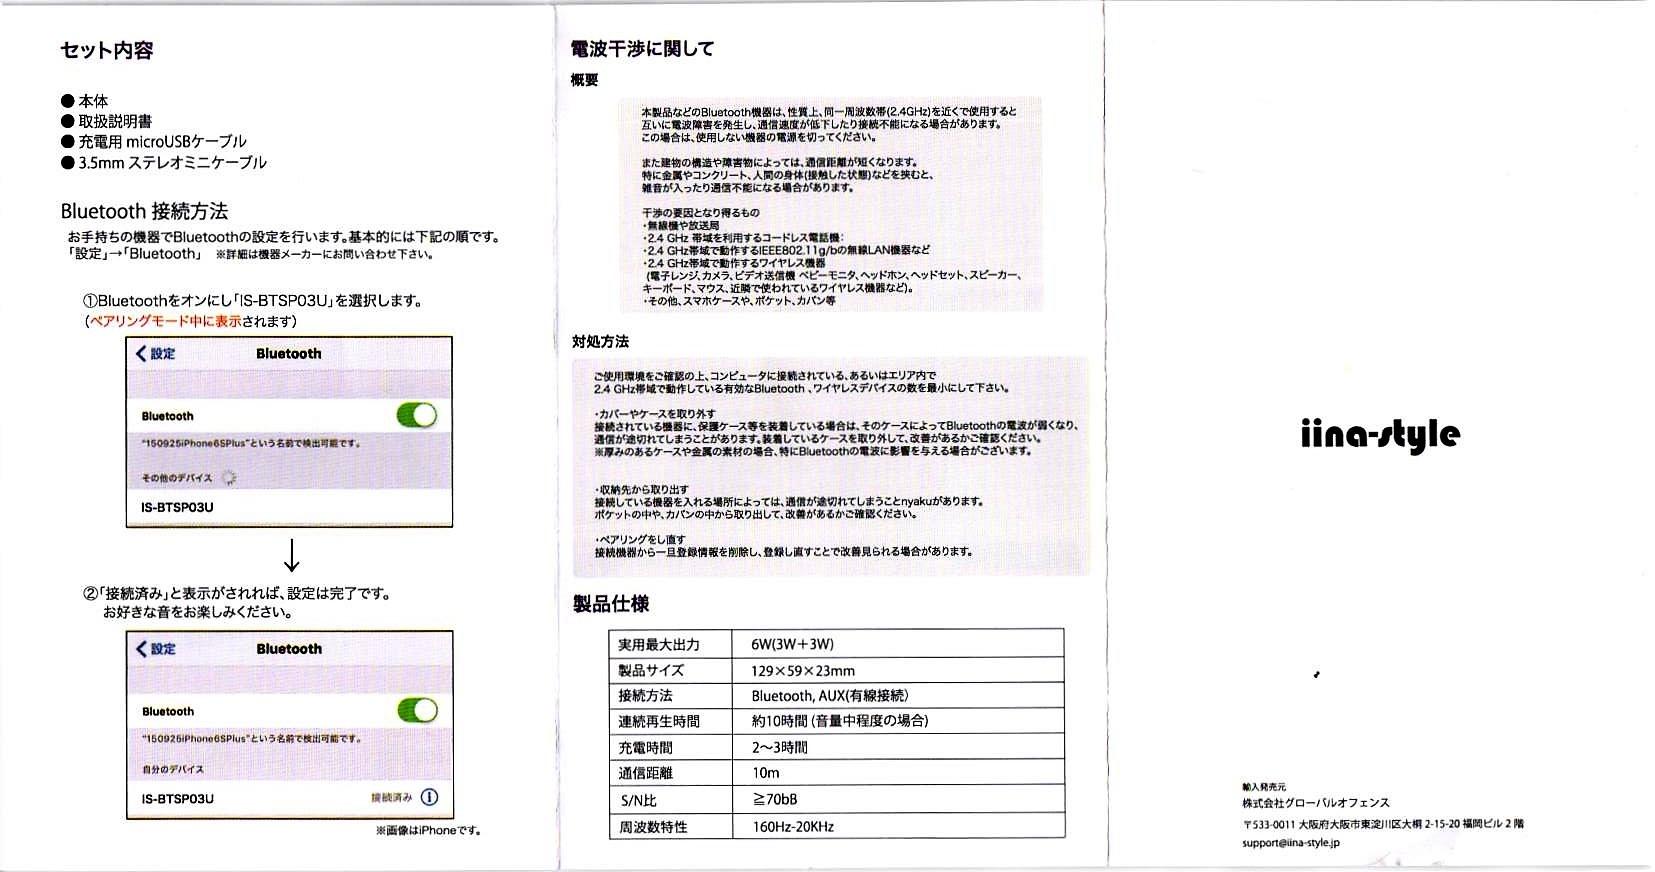 iina-style Bluetooth4.1スピーカー IS-BTSP03U 取説2